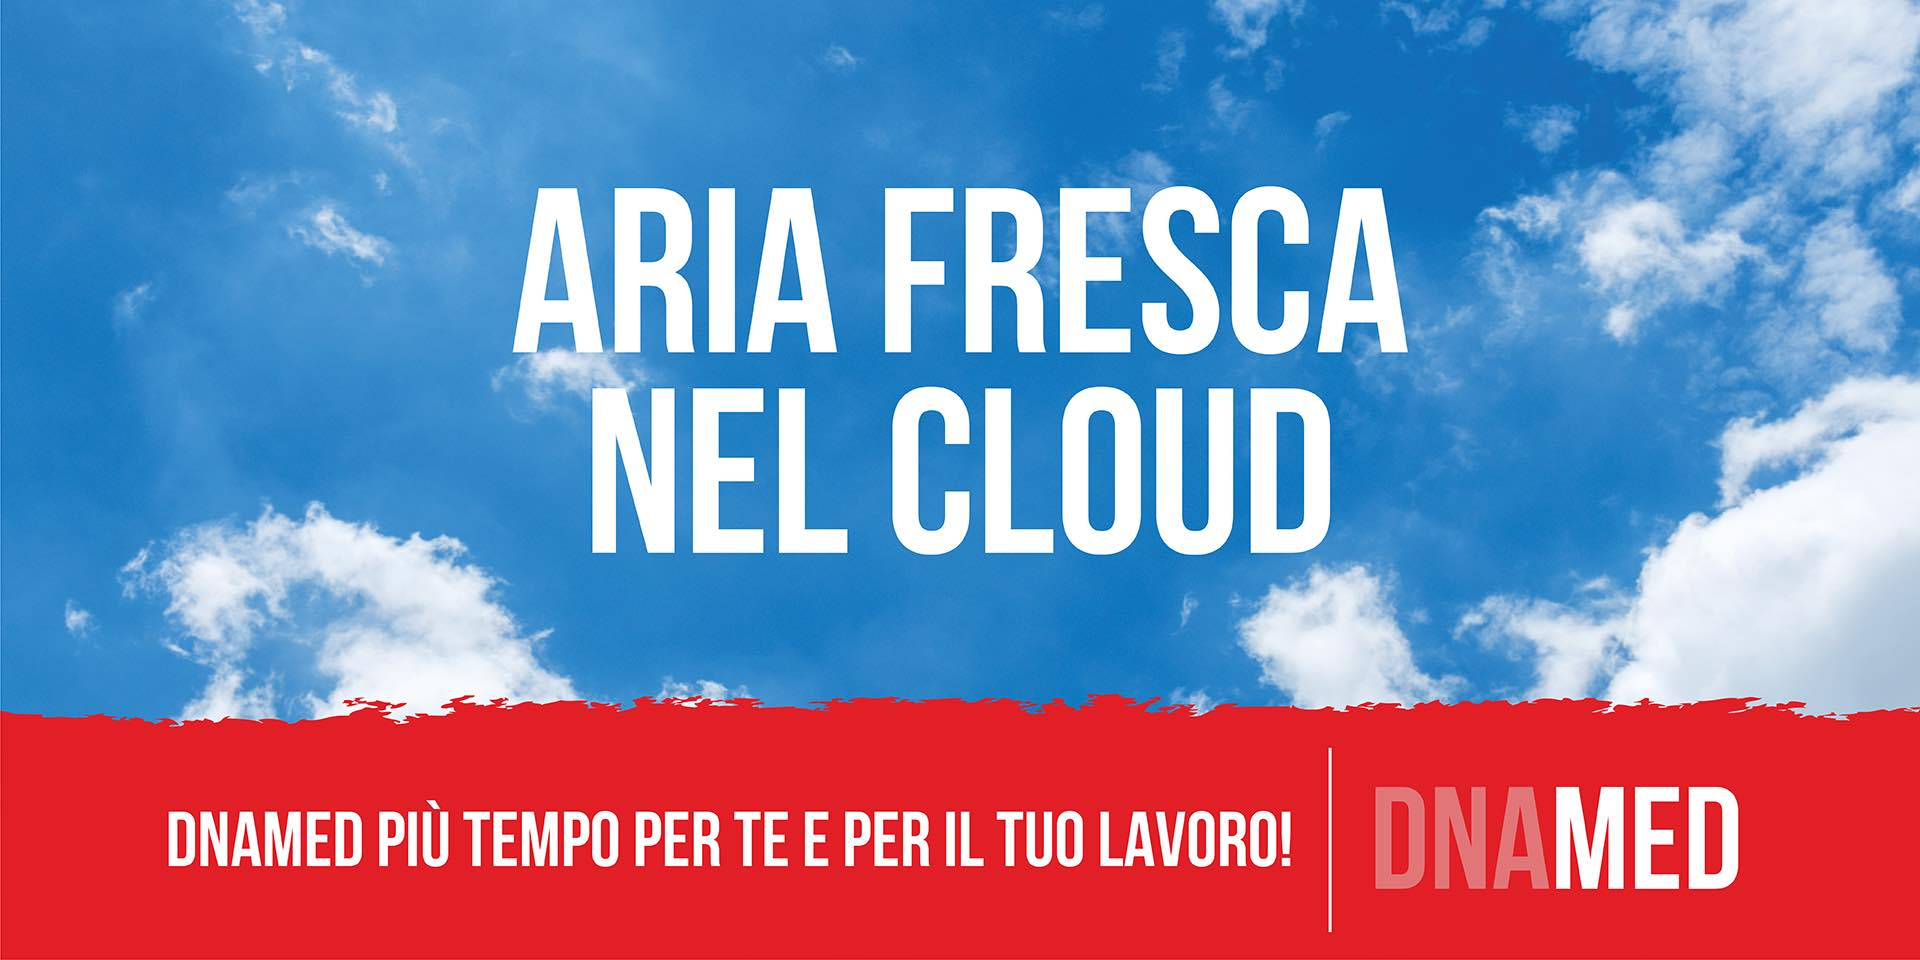 Dnamed Aria fresca nel Cloud